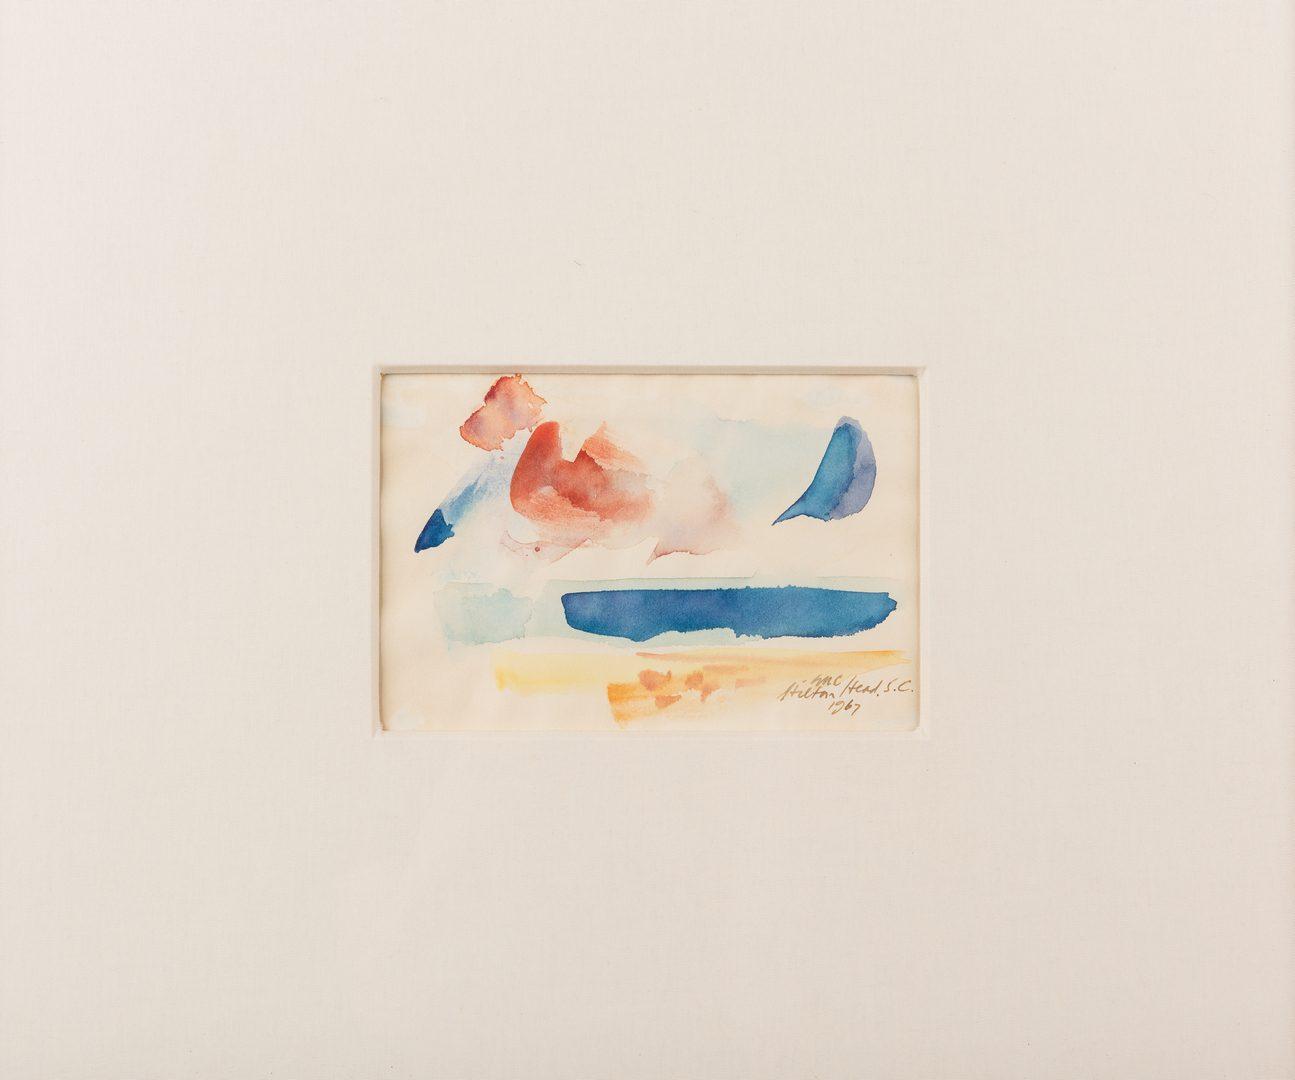 Lot 51: George Cress Small Watercolor, Hilton Head